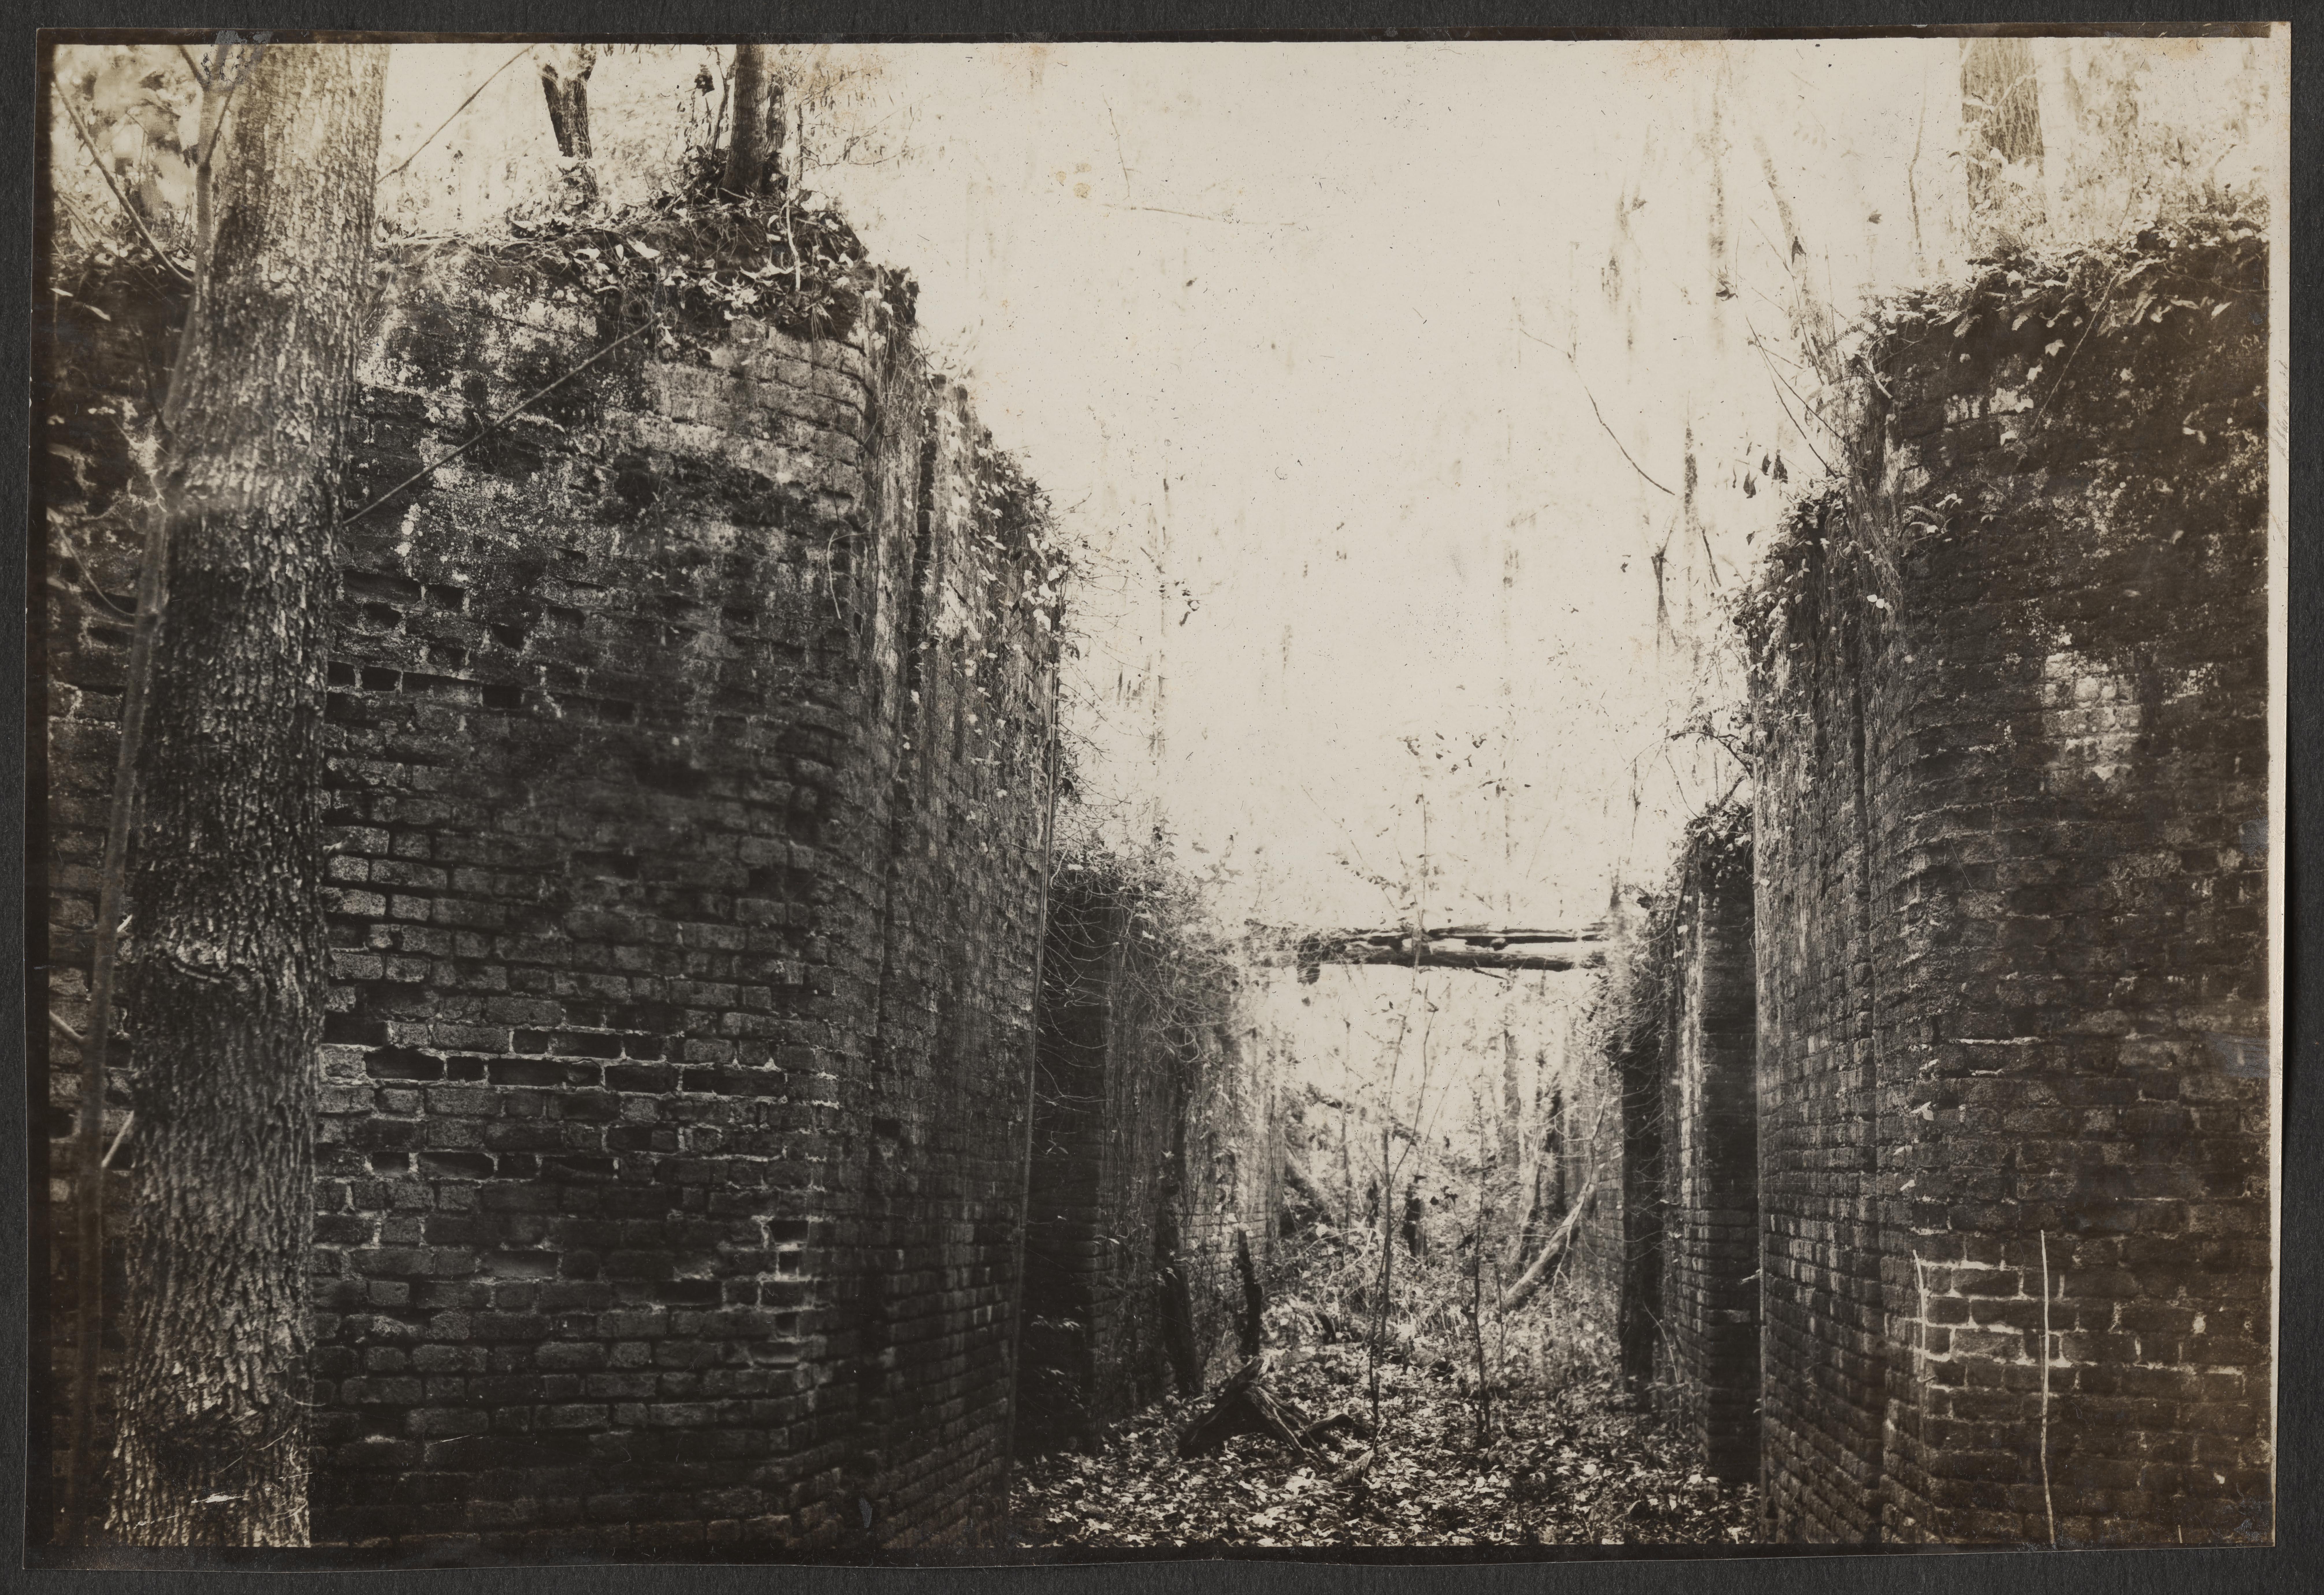 Santee-Cooper Cemetery Investigation 012